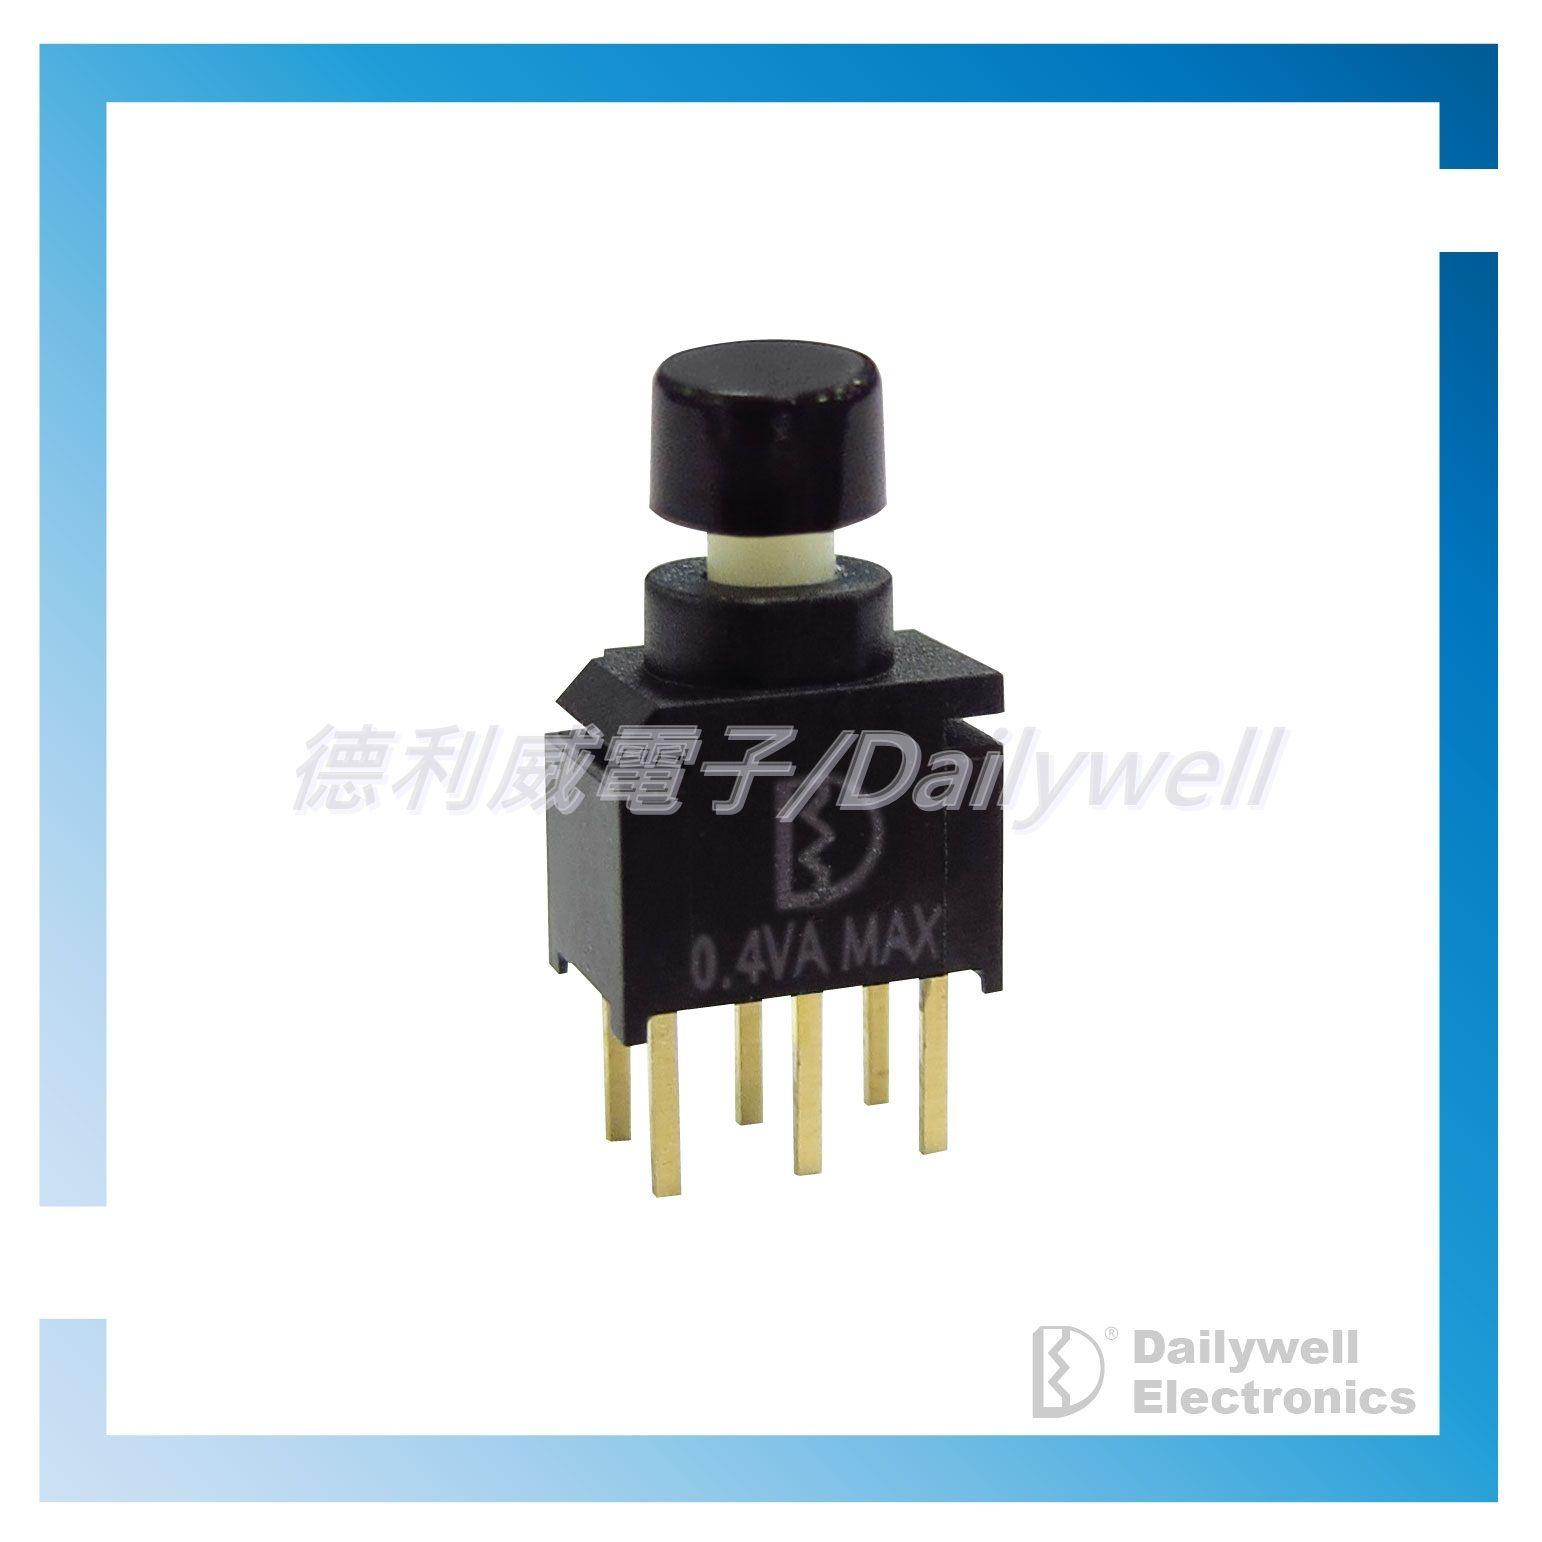 Sealed Ultra-Miniature Pushbutton Switches